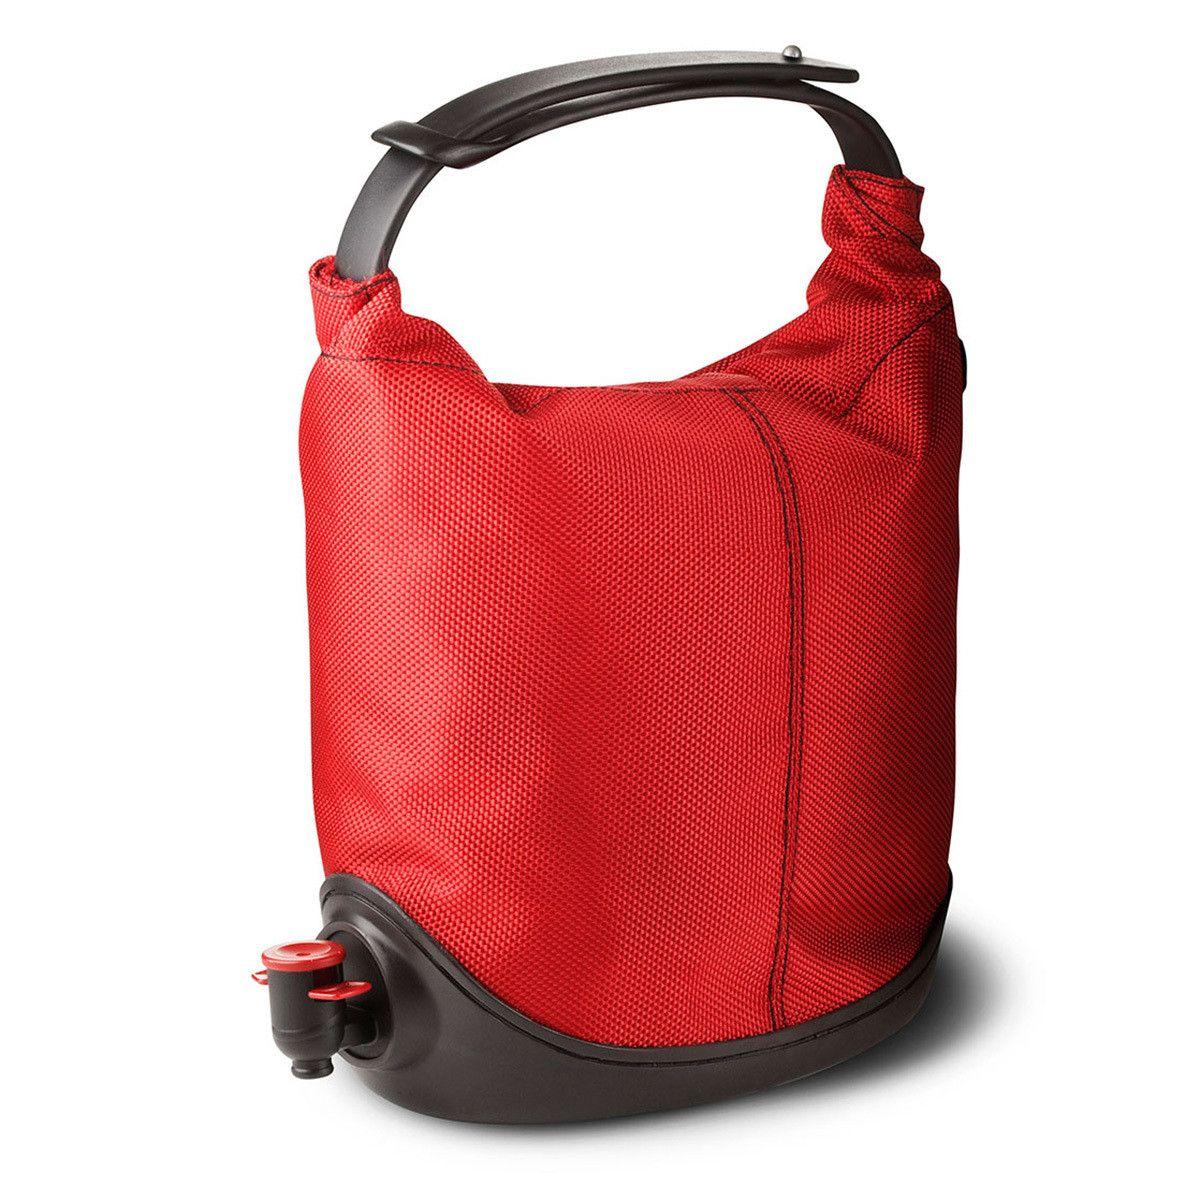 Fab Com Baggy Winecoat Red Menu Wine Purse Wine Bag Wine Flask